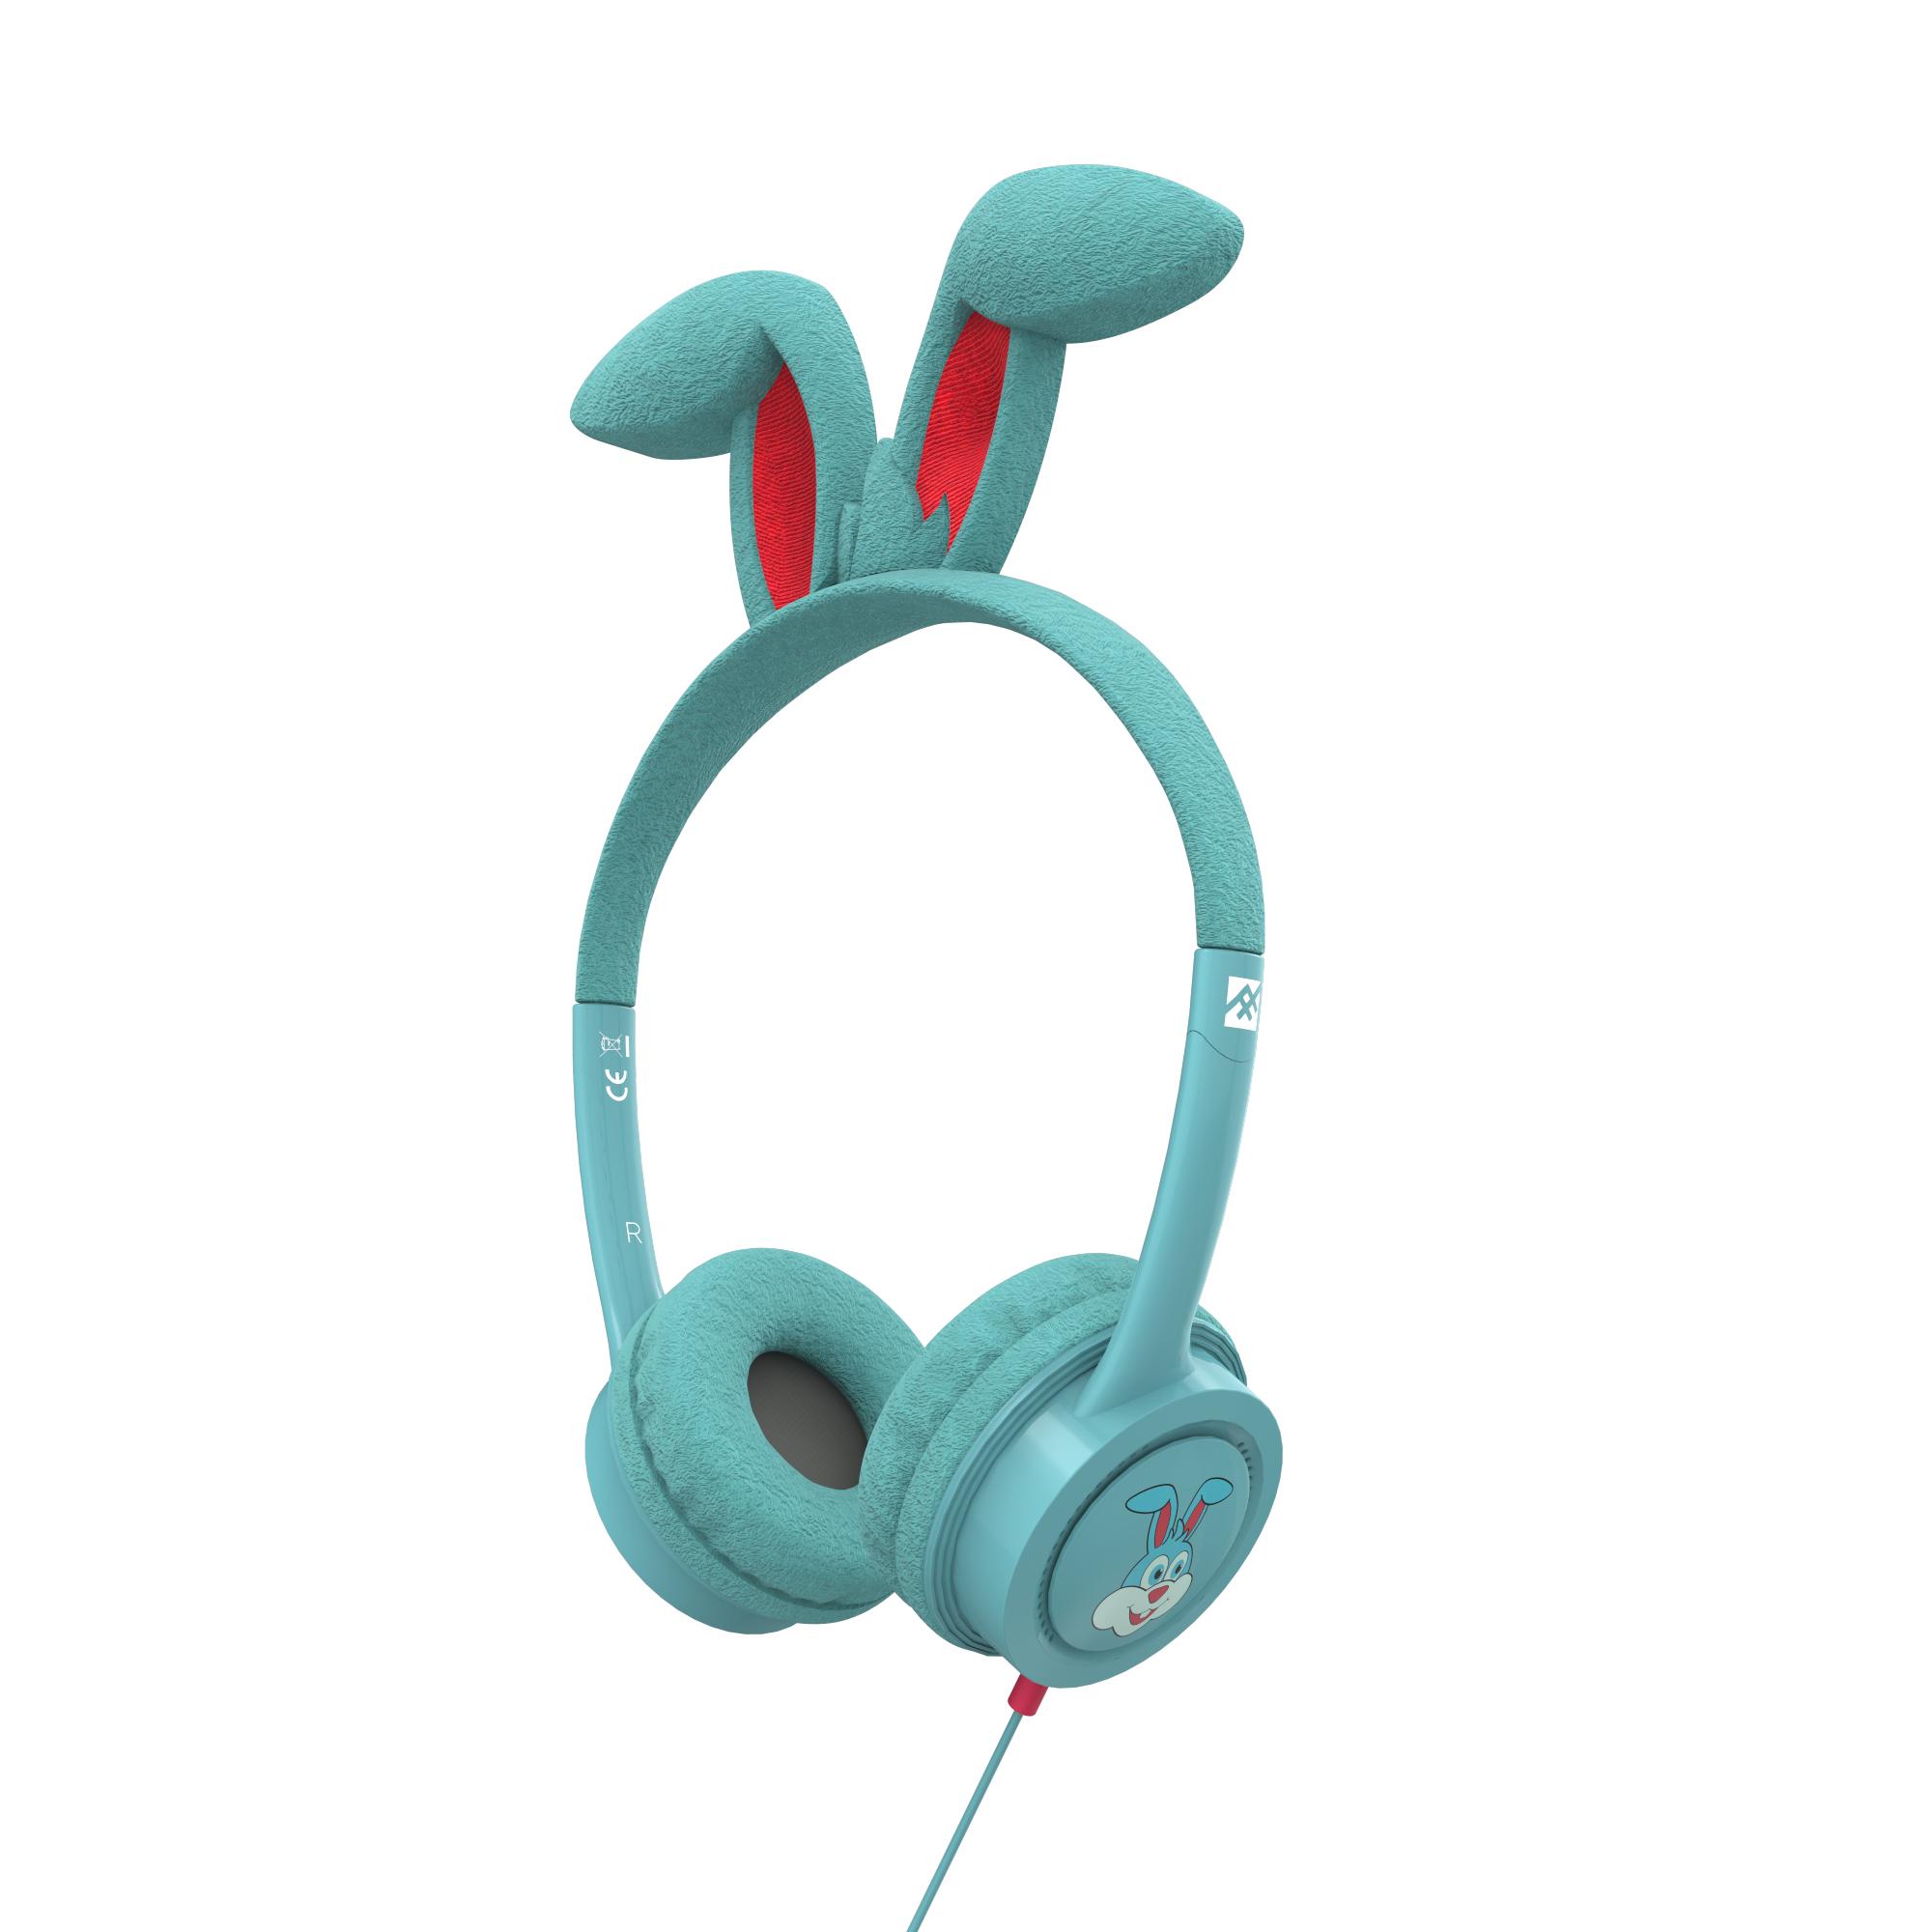 IFROGZ 304101846 auricular y casco Auriculares Diadema Verde